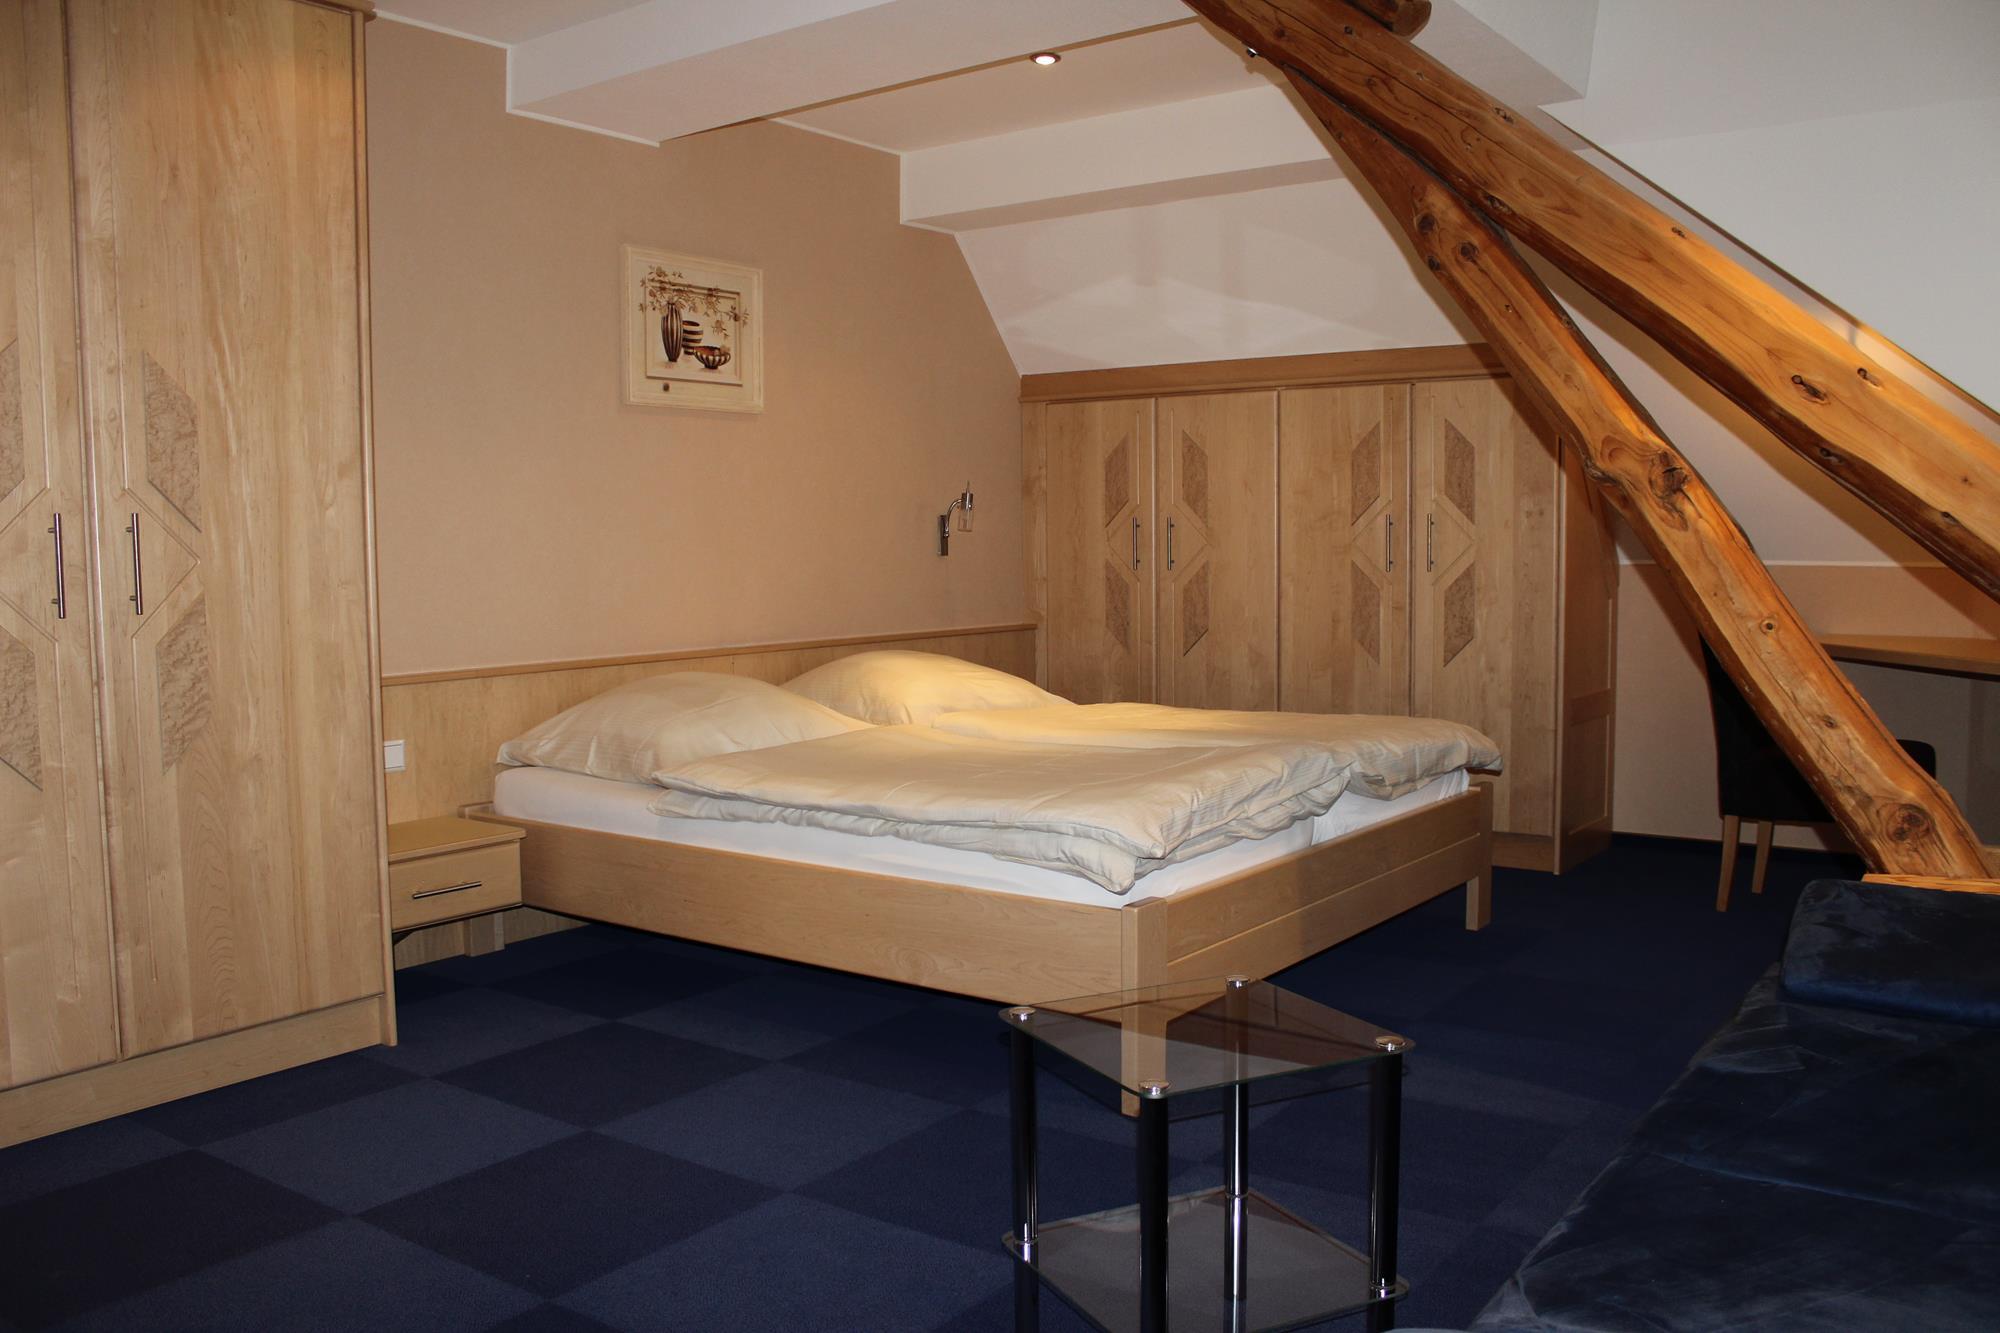 Chambre double - Chambres - Hôtel-Restaurant Reiff - Fischbach ...